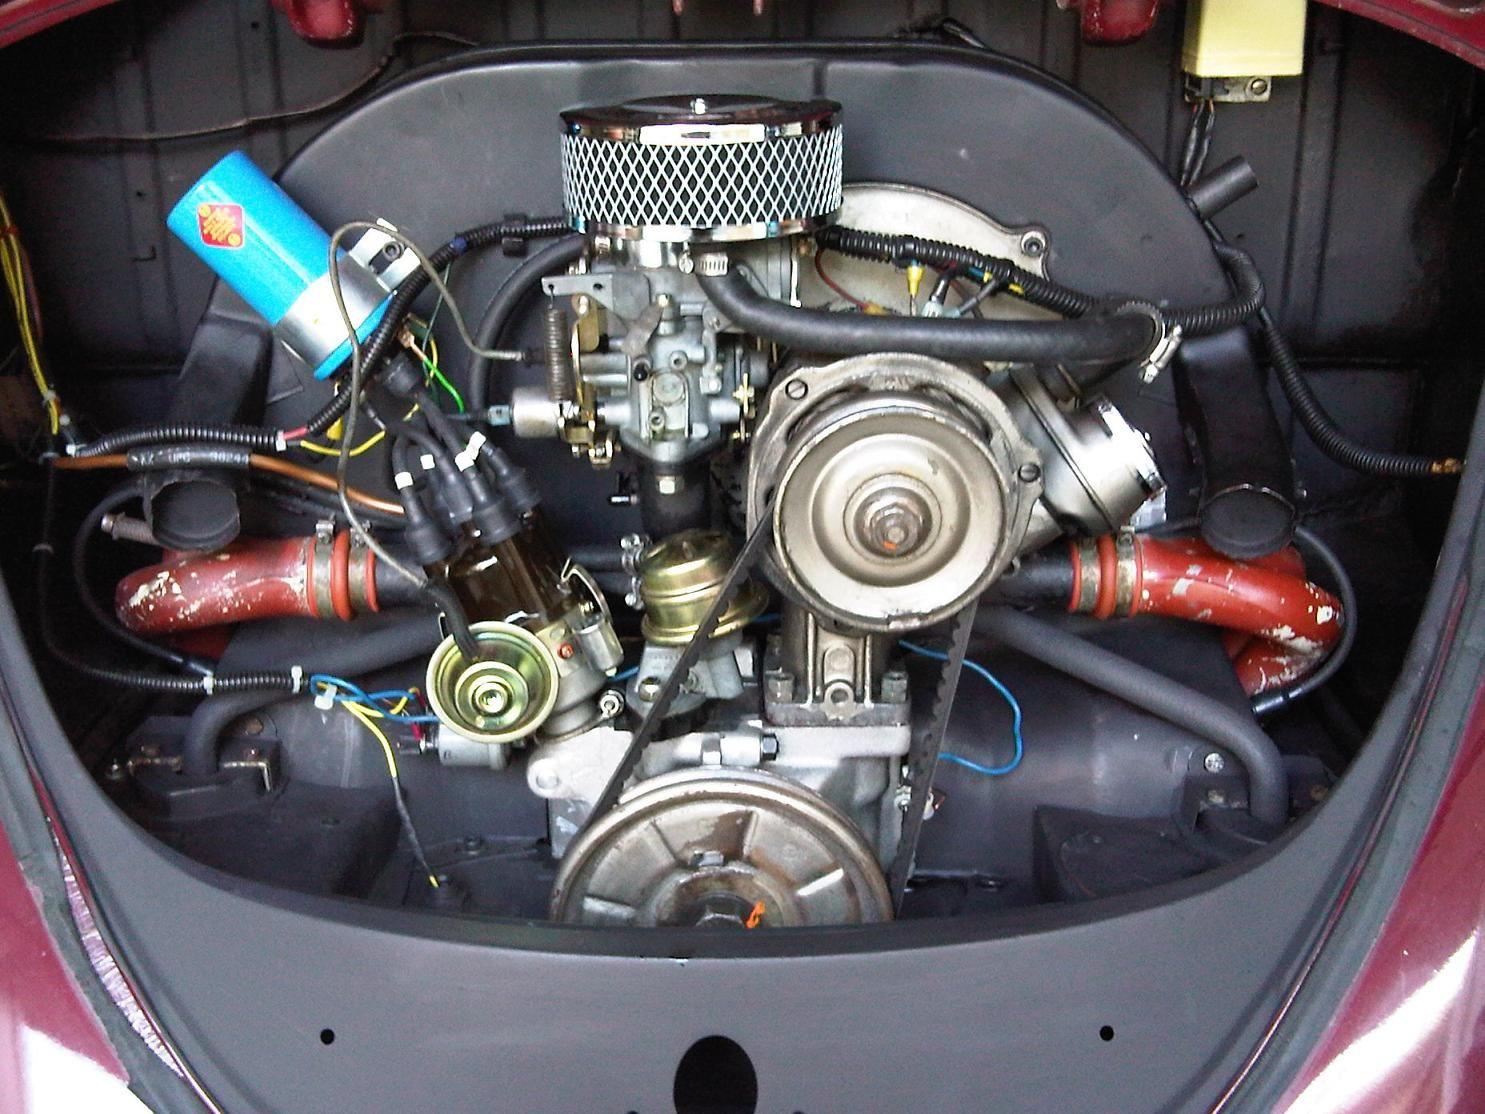 medium resolution of clean 1600cc engine in a standard bug the progressive dual weber carburetor is a nice